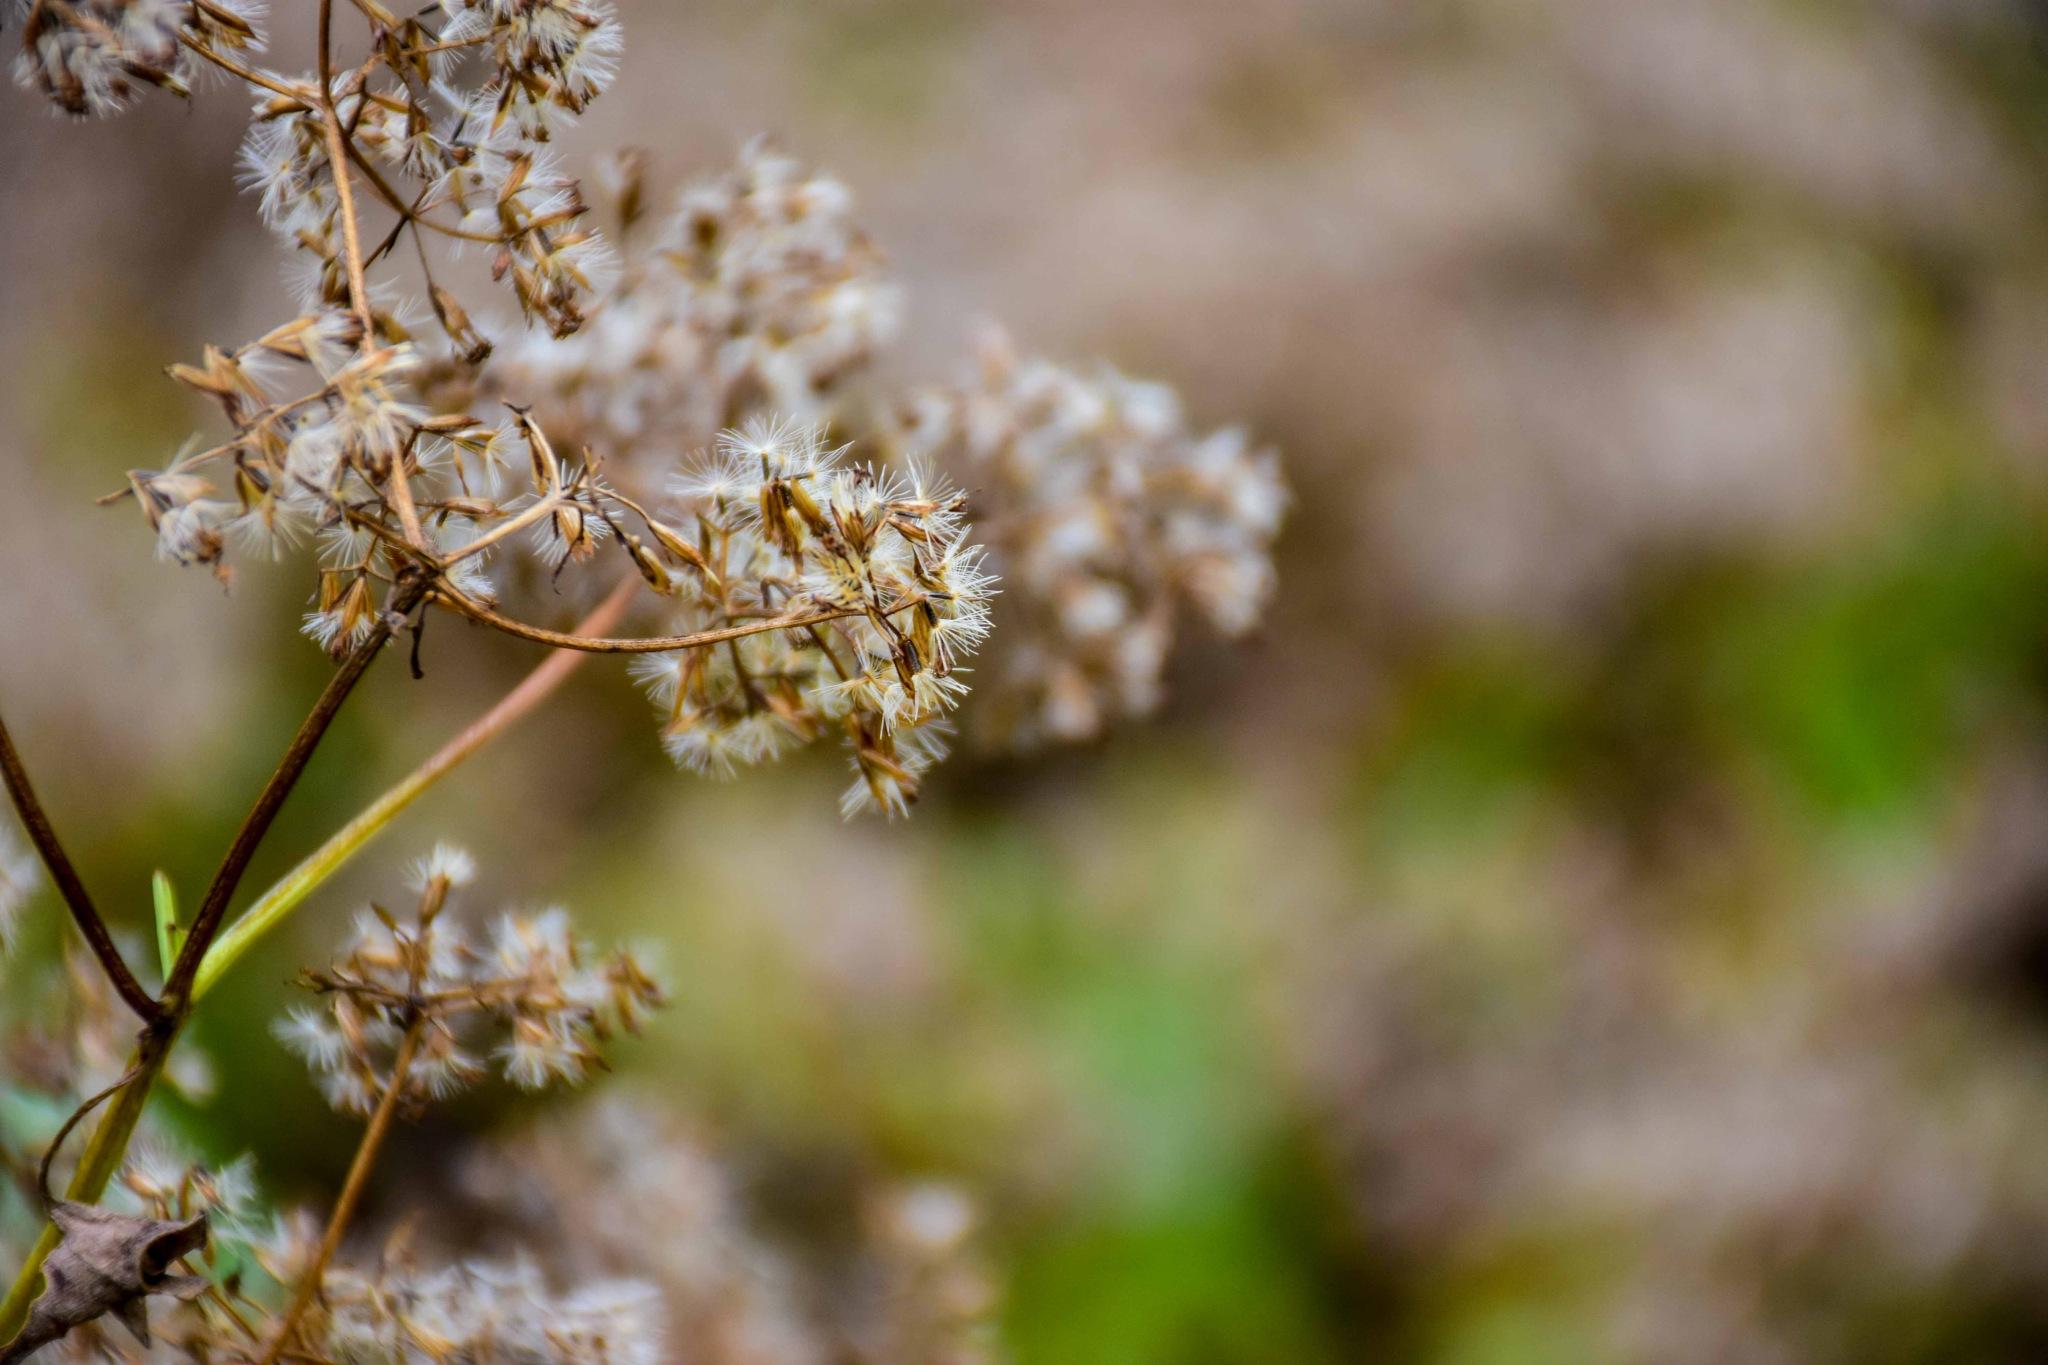 Grass by ayyashahamed1